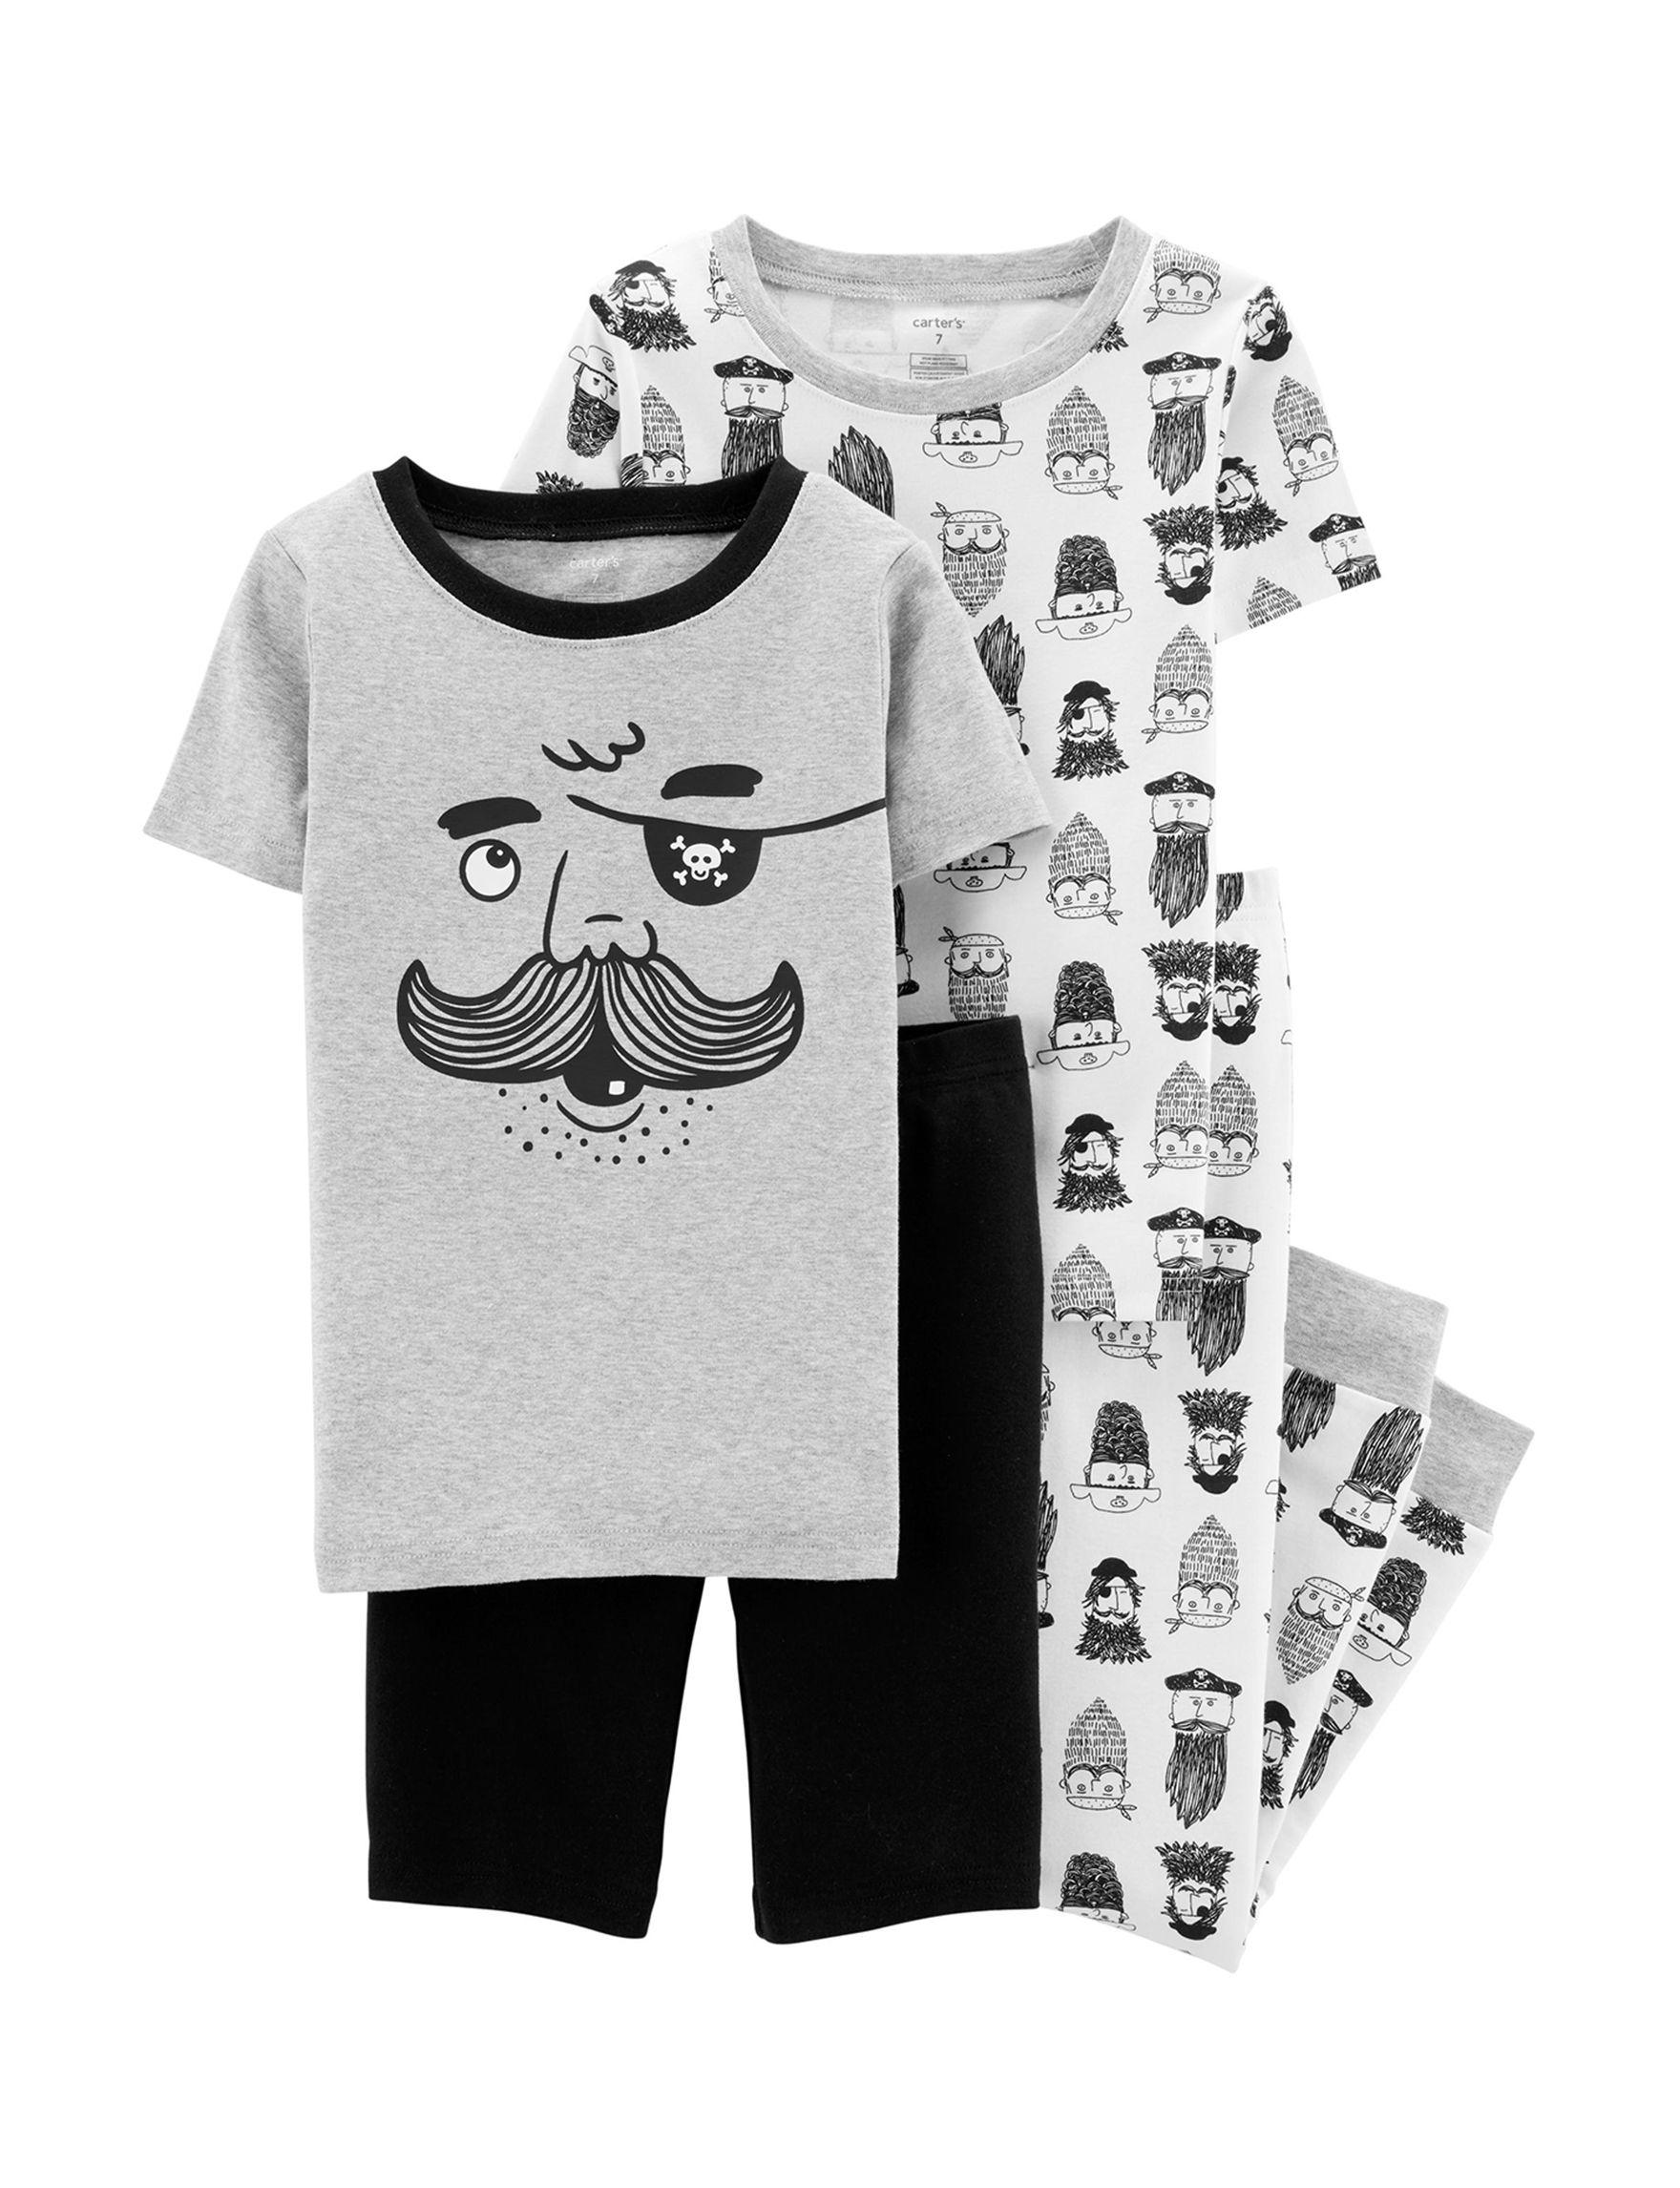 Carter's Grey / Black Pajama Sets